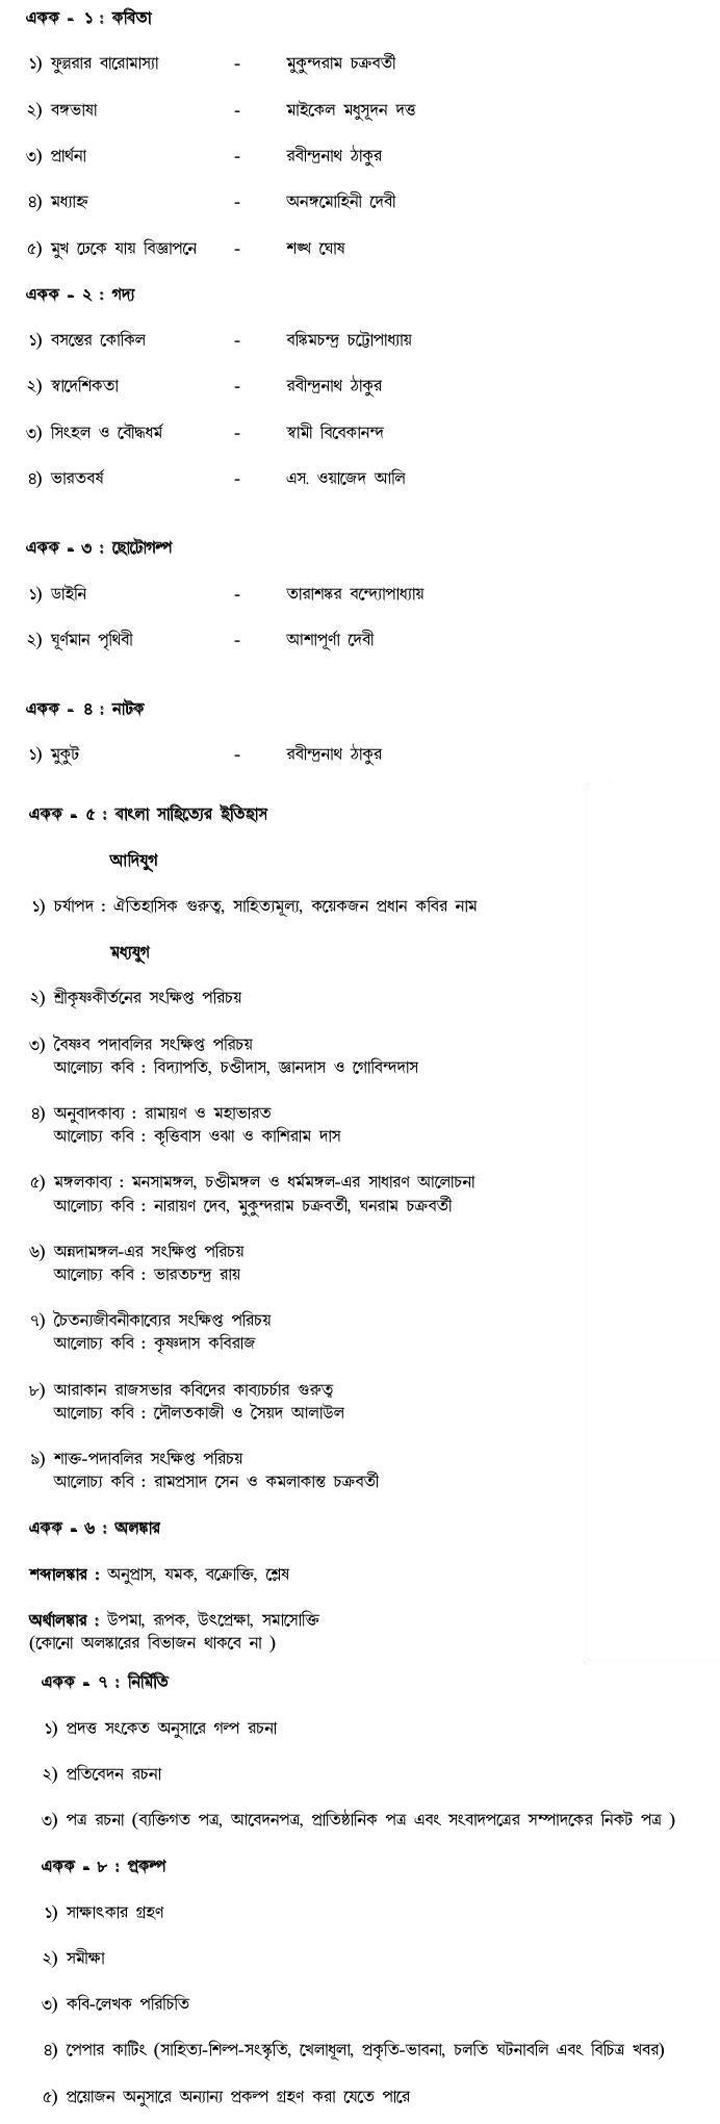 Tripura Board Class 11 Syllabus -Bengali